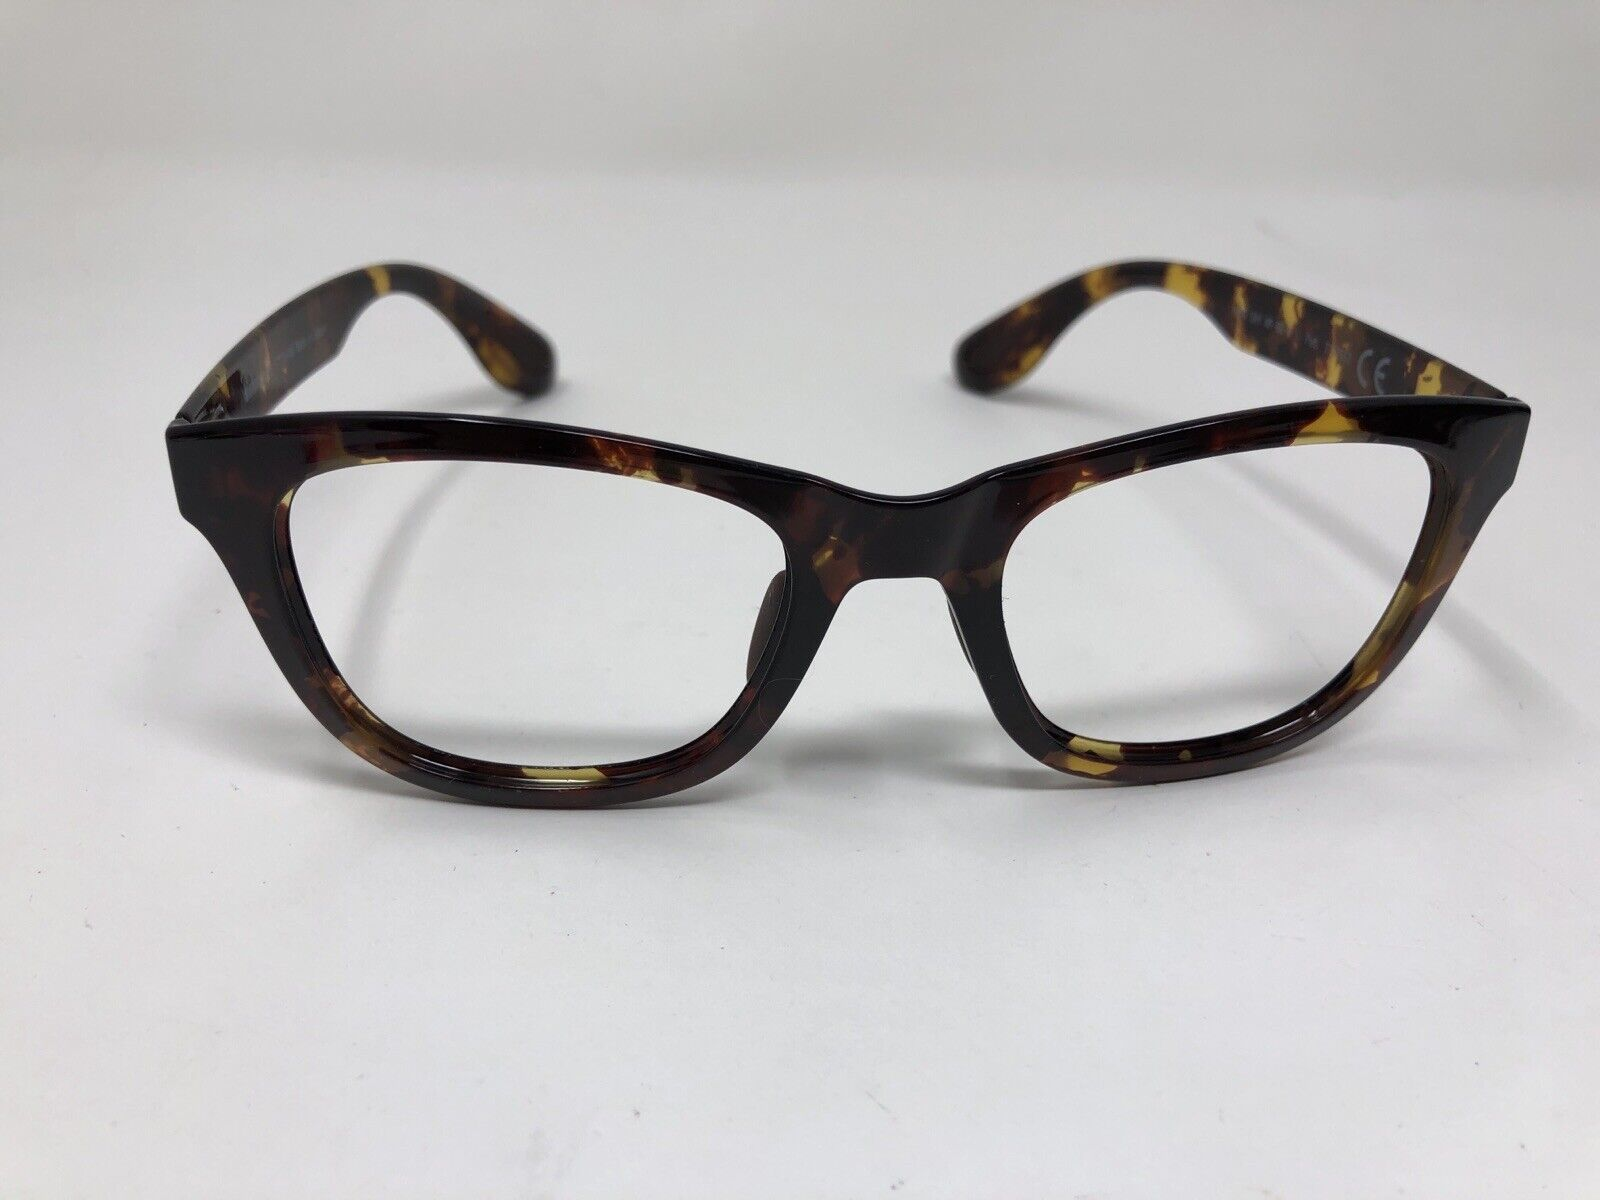 Maui Jim HANA BAY MJ434-10L Tokyo Tortoise Sunglasses Frames Only 51-20-146 ZF17